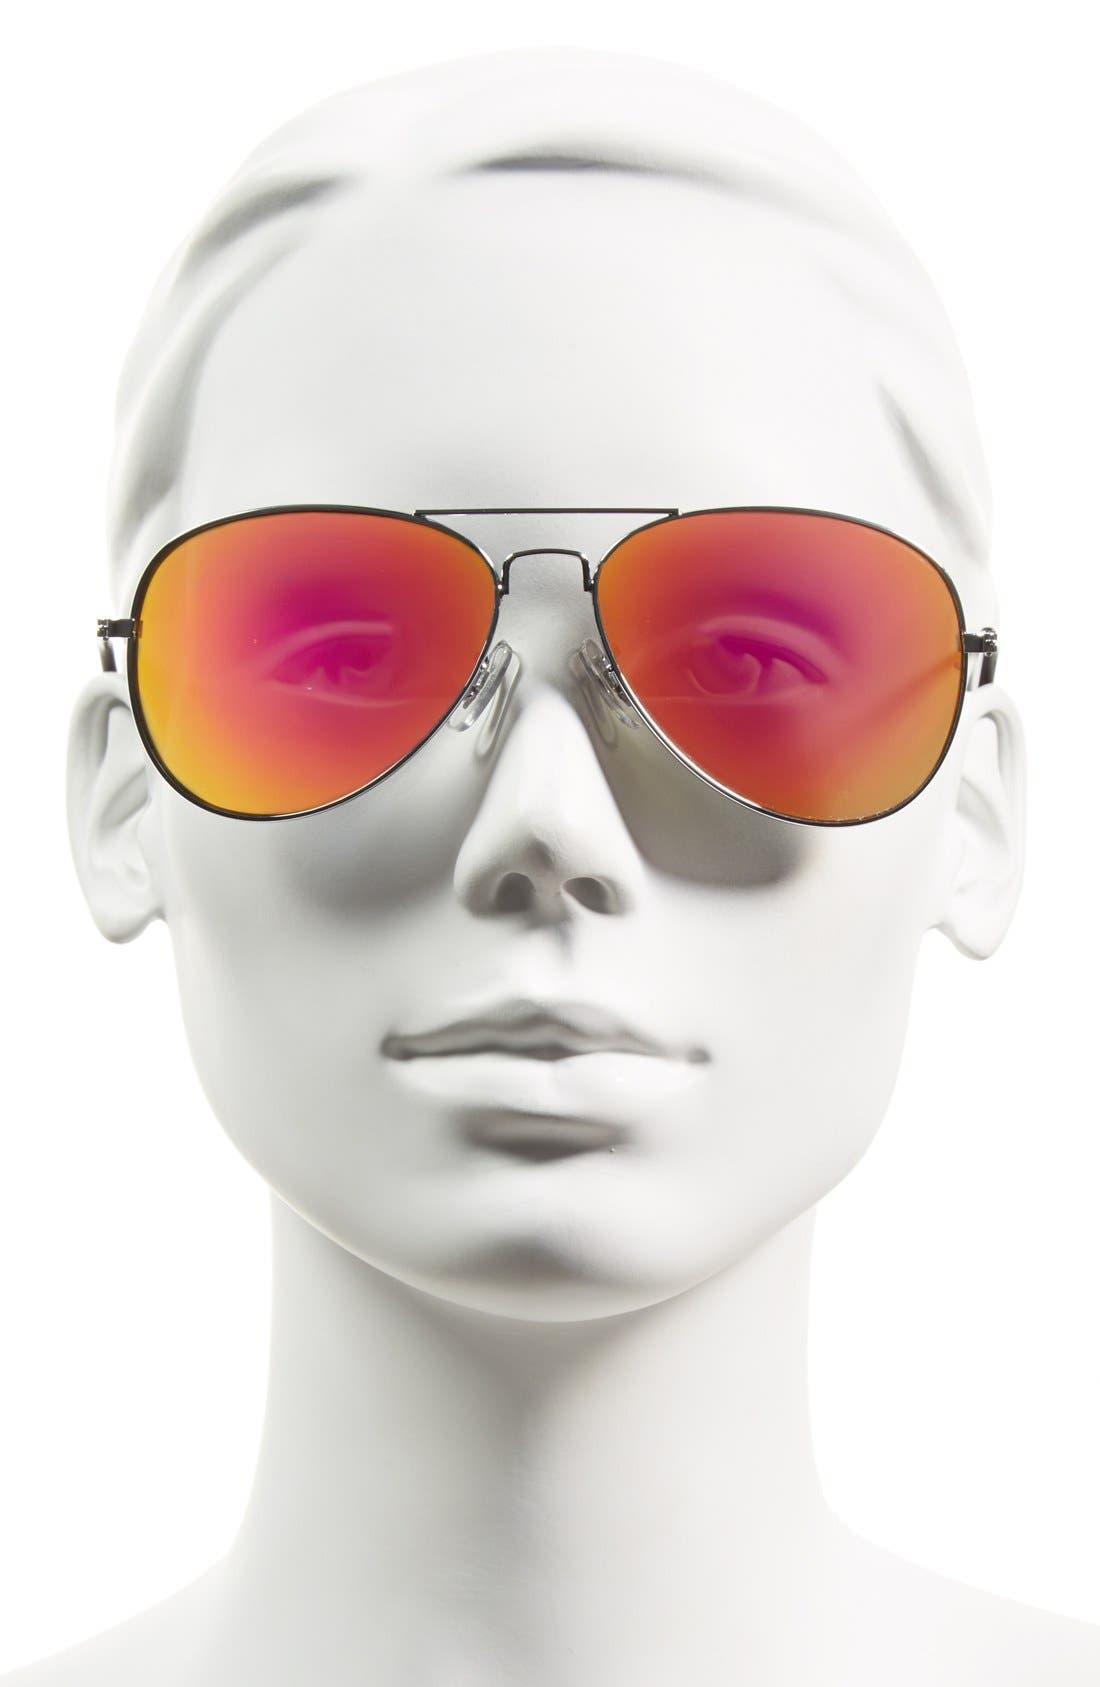 55mm Mirrored Aviator Sunglasses,                             Alternate thumbnail 2, color,                             040